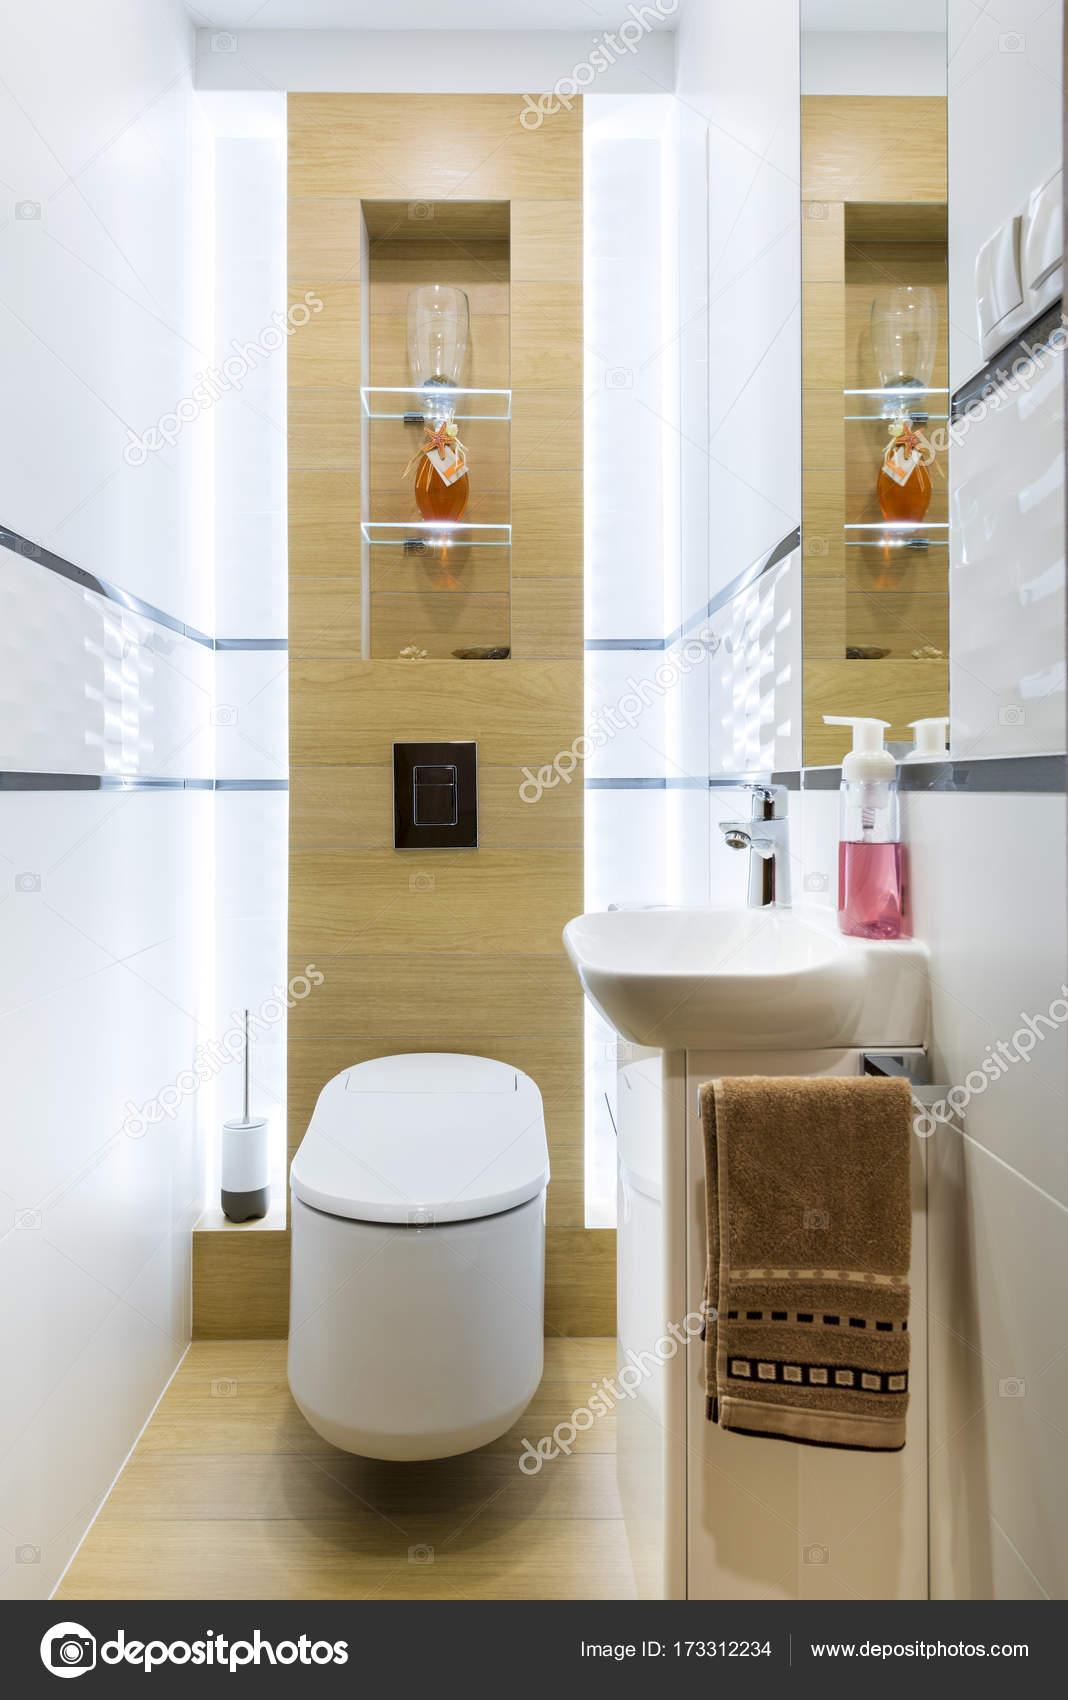 ba o modernos peque os fotos de stock jacek kadaj 173312234. Black Bedroom Furniture Sets. Home Design Ideas